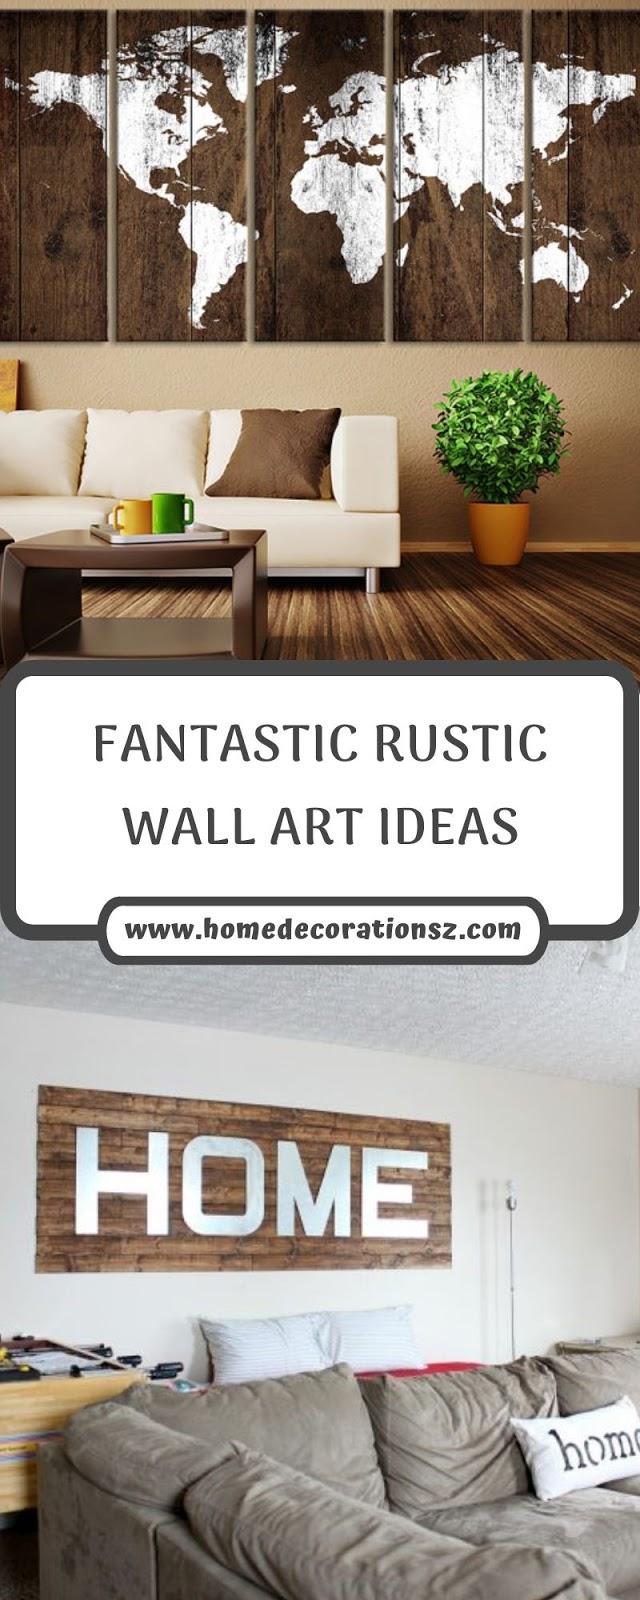 FANTASTIC RUSTIC WALL ART IDEAS